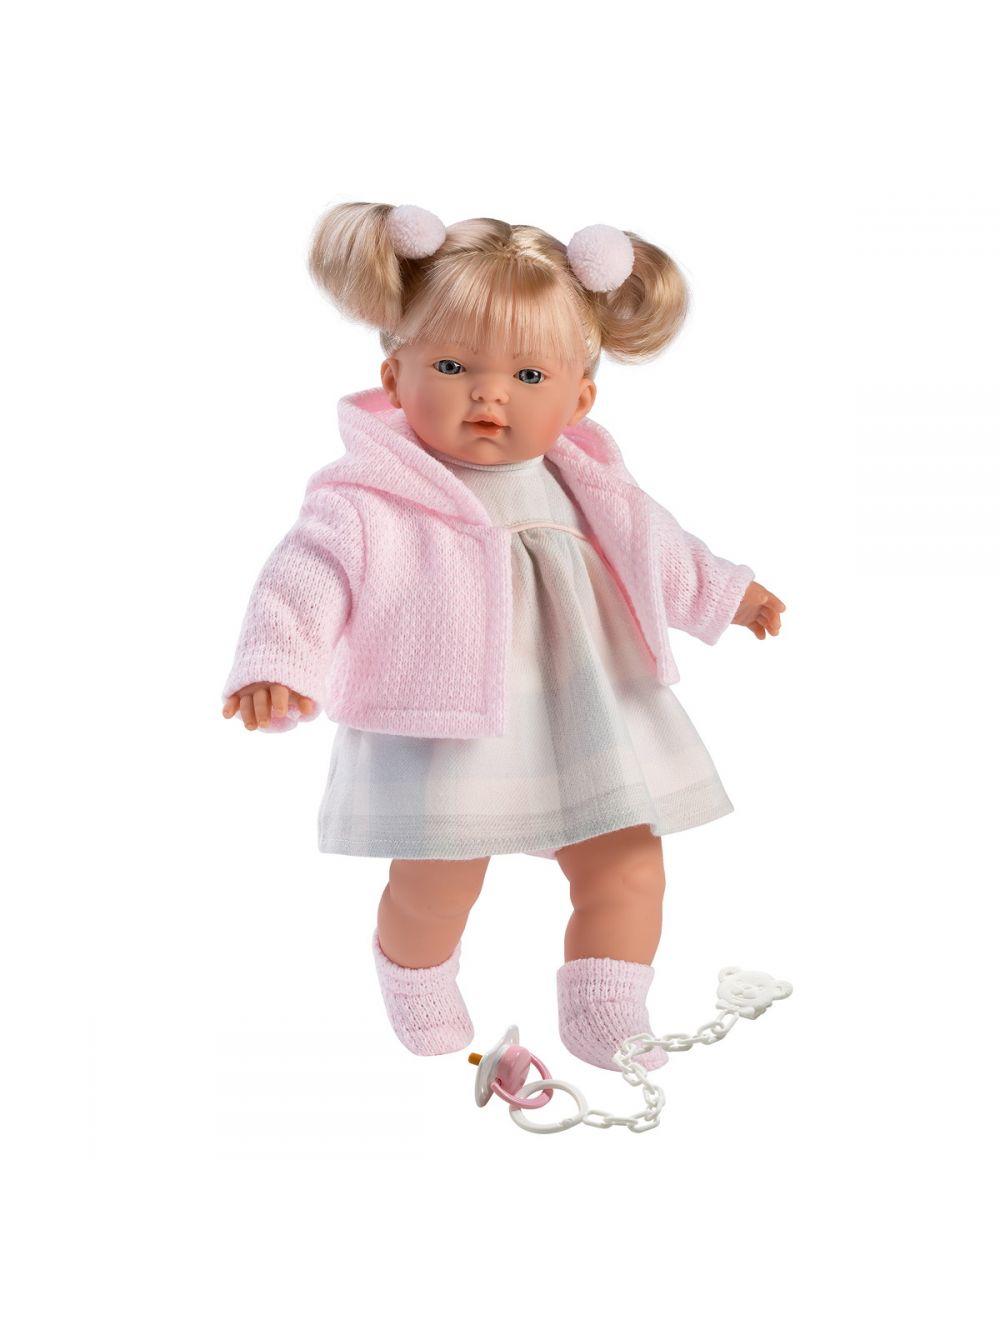 Llorens 33102 Lalka płacząca Aitana 33 cm różowa blondynka